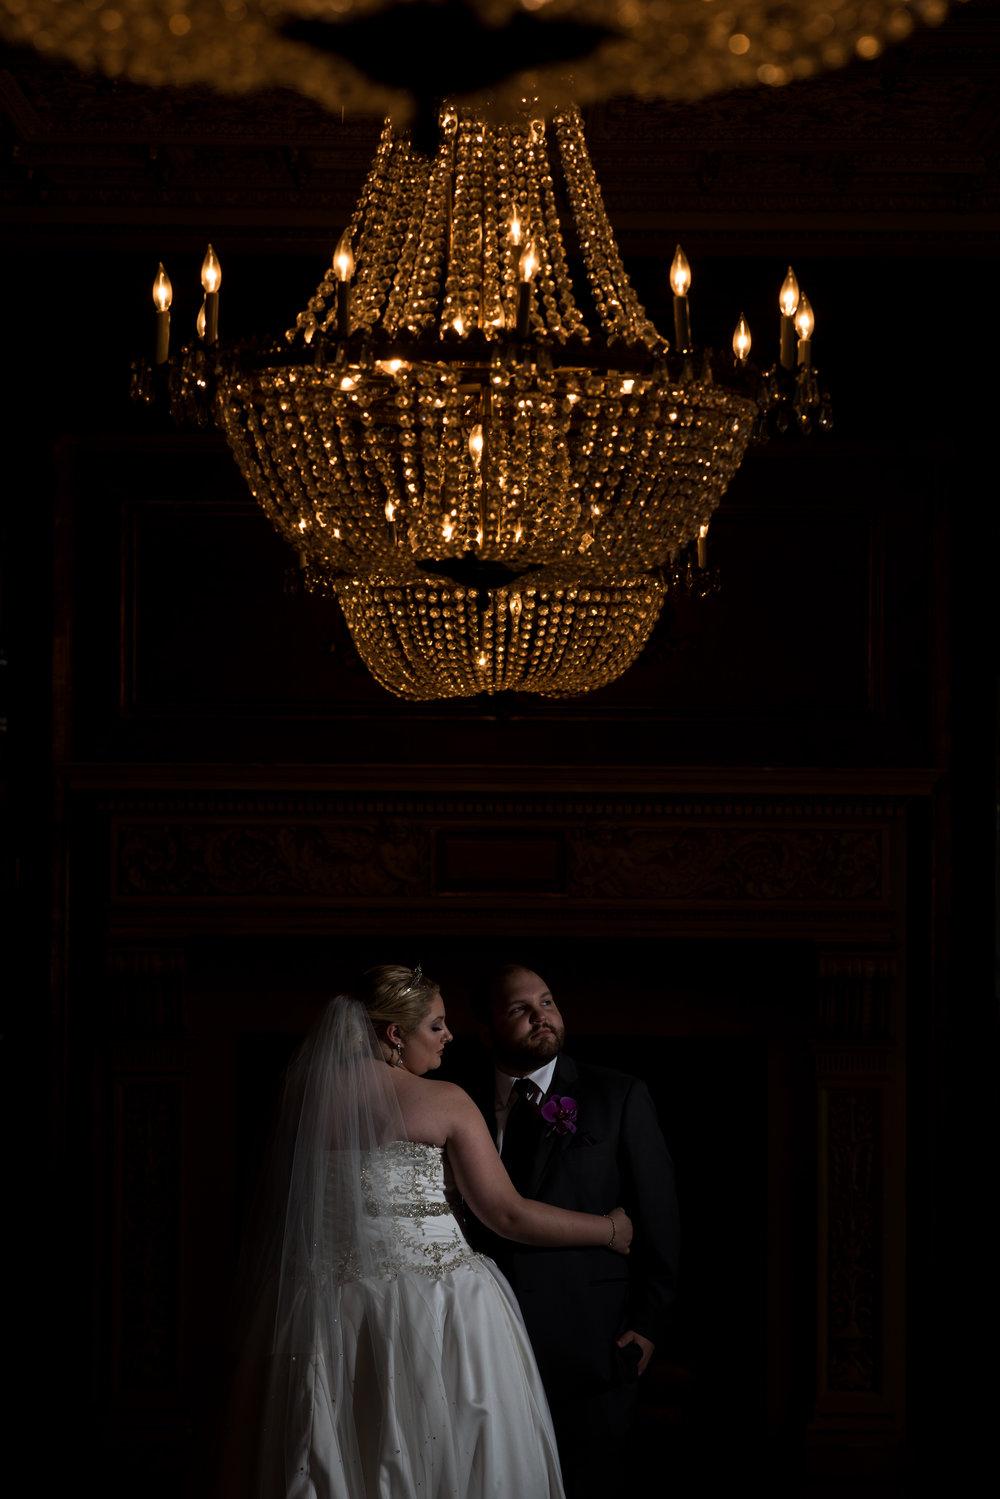 AMANDA & JONATHAN - MARRIED JUNE 4, 2017